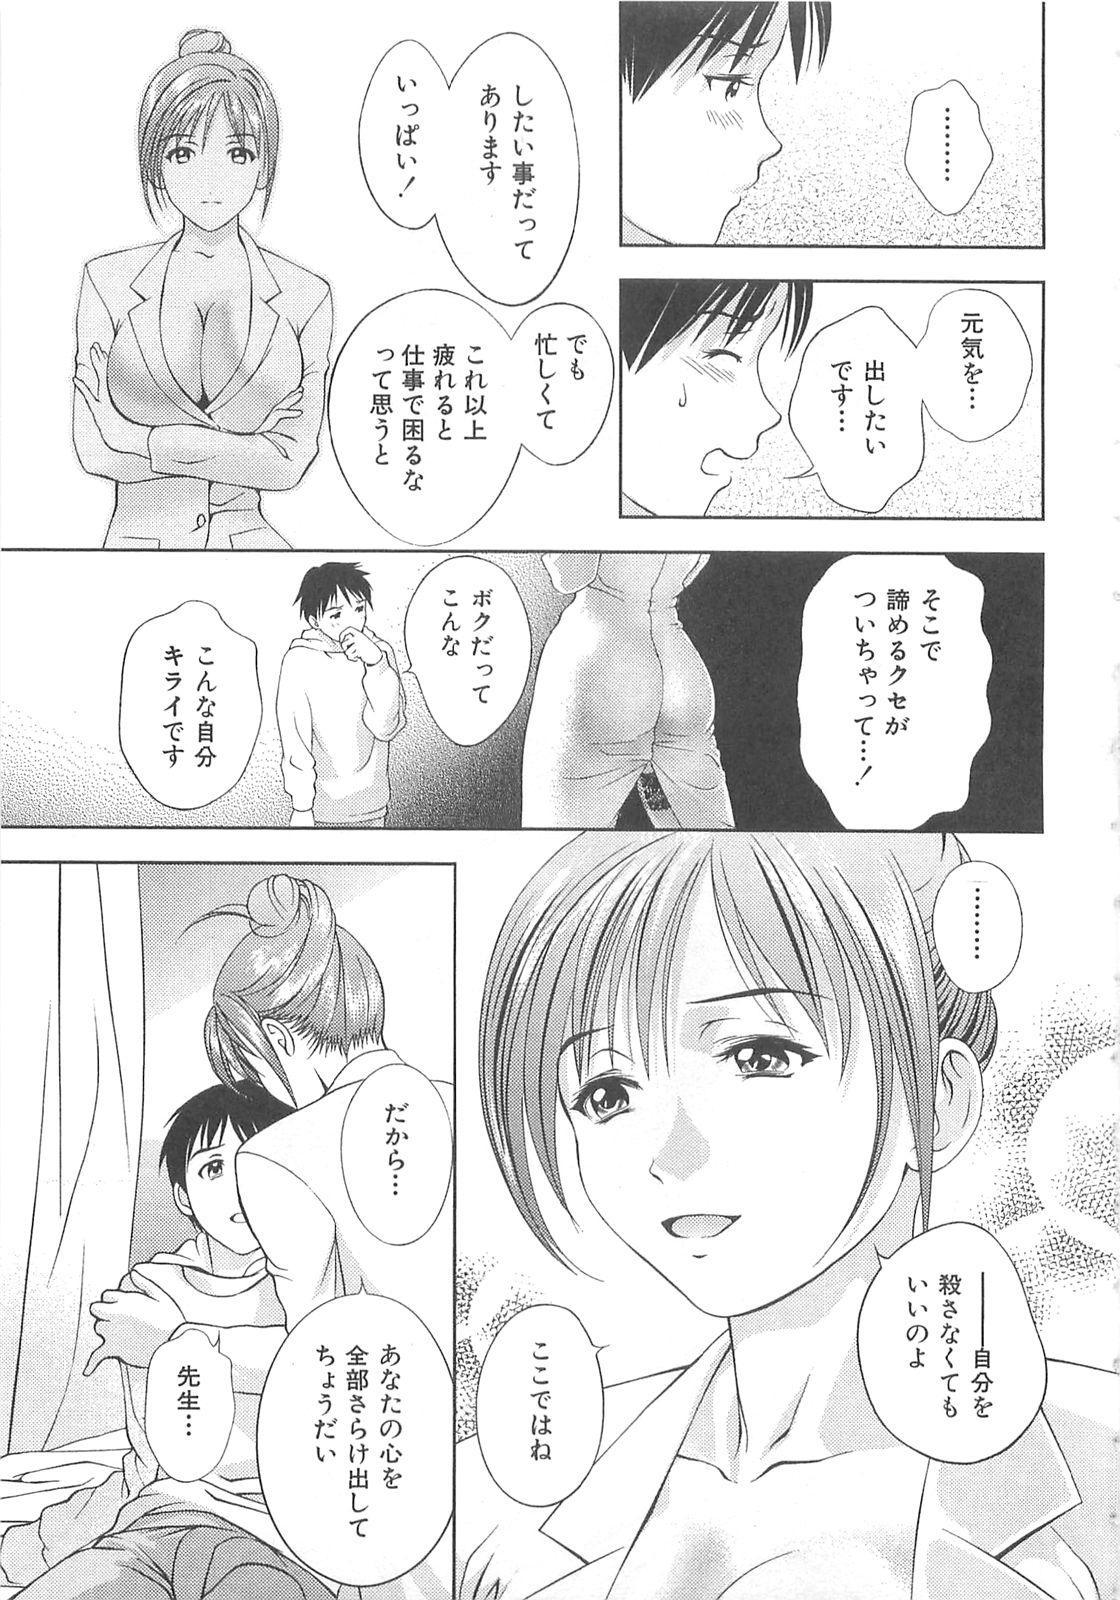 Tenshi no Kyuu - Angel's Pretty Hip 131